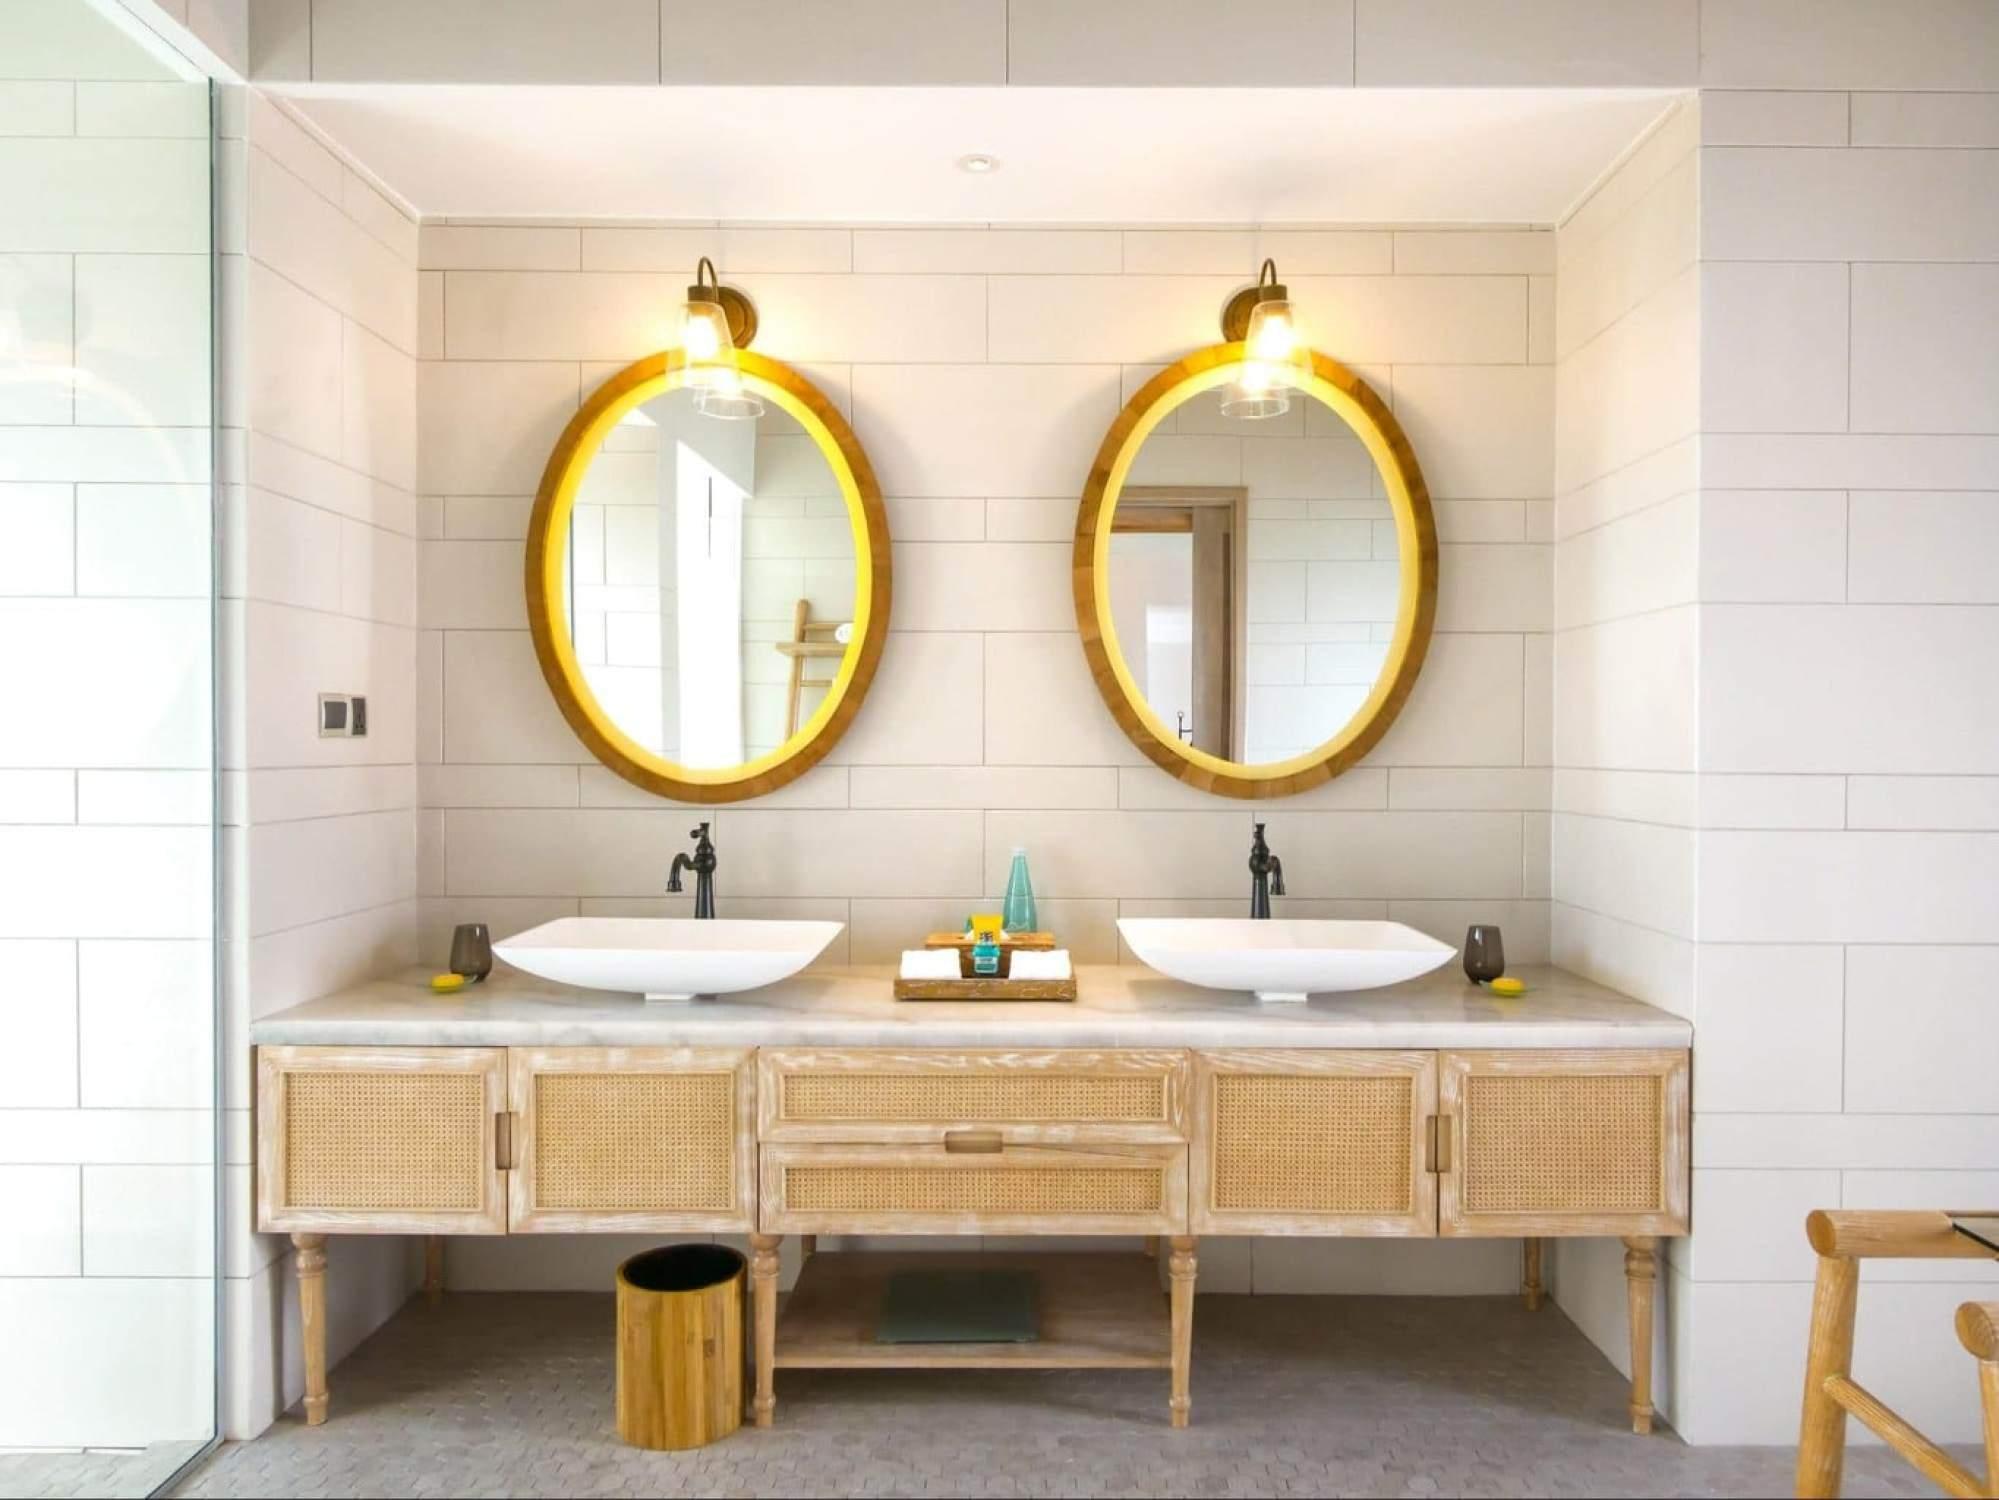 Bathroom at Milaidhoo